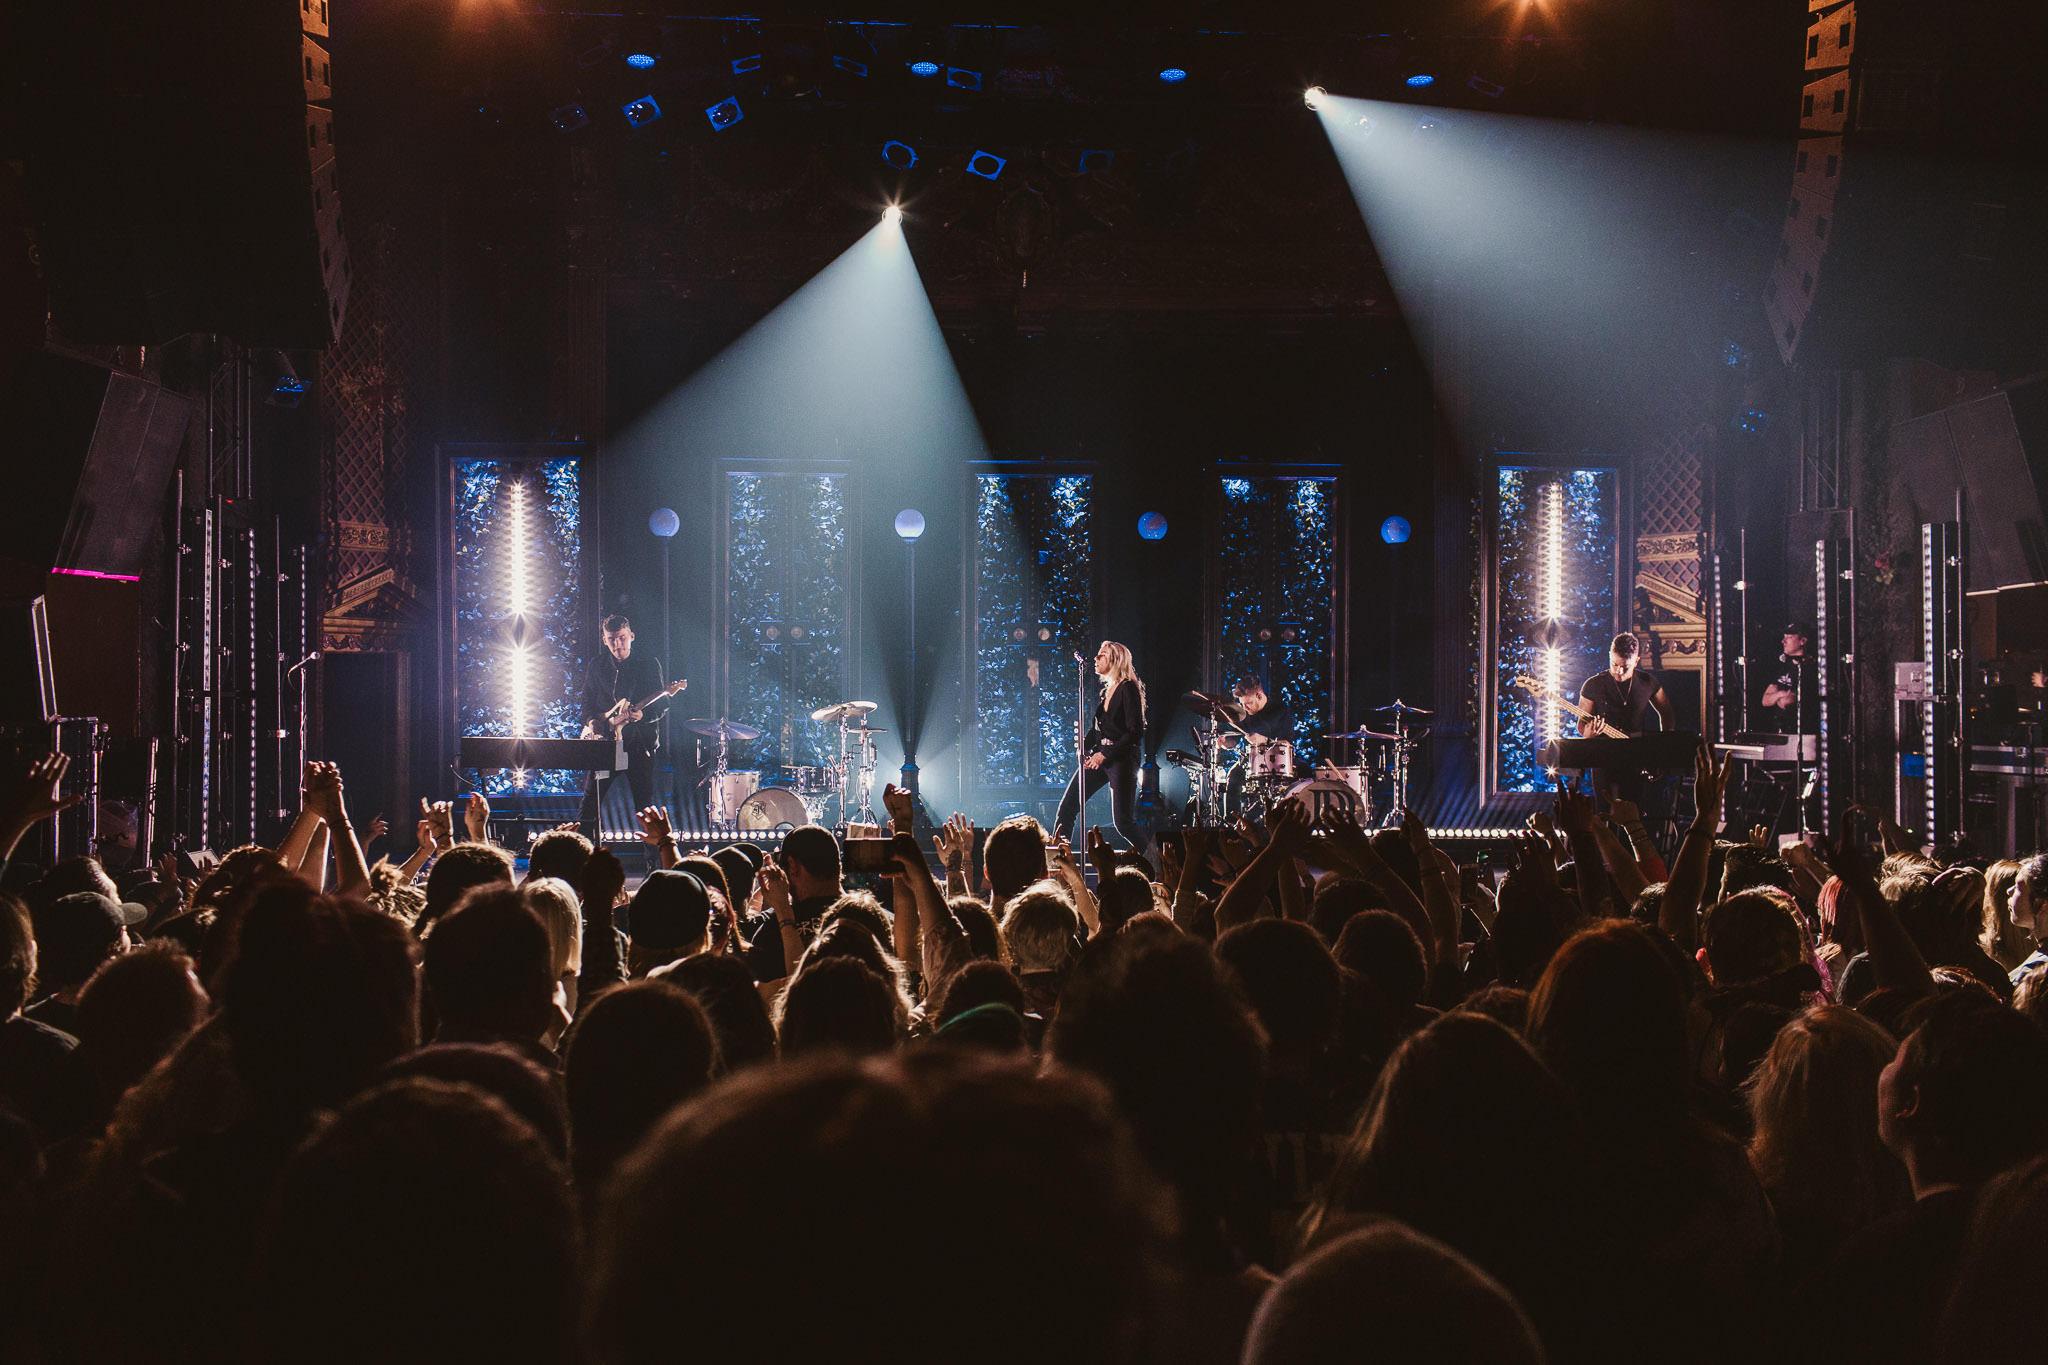 concert photography lighting